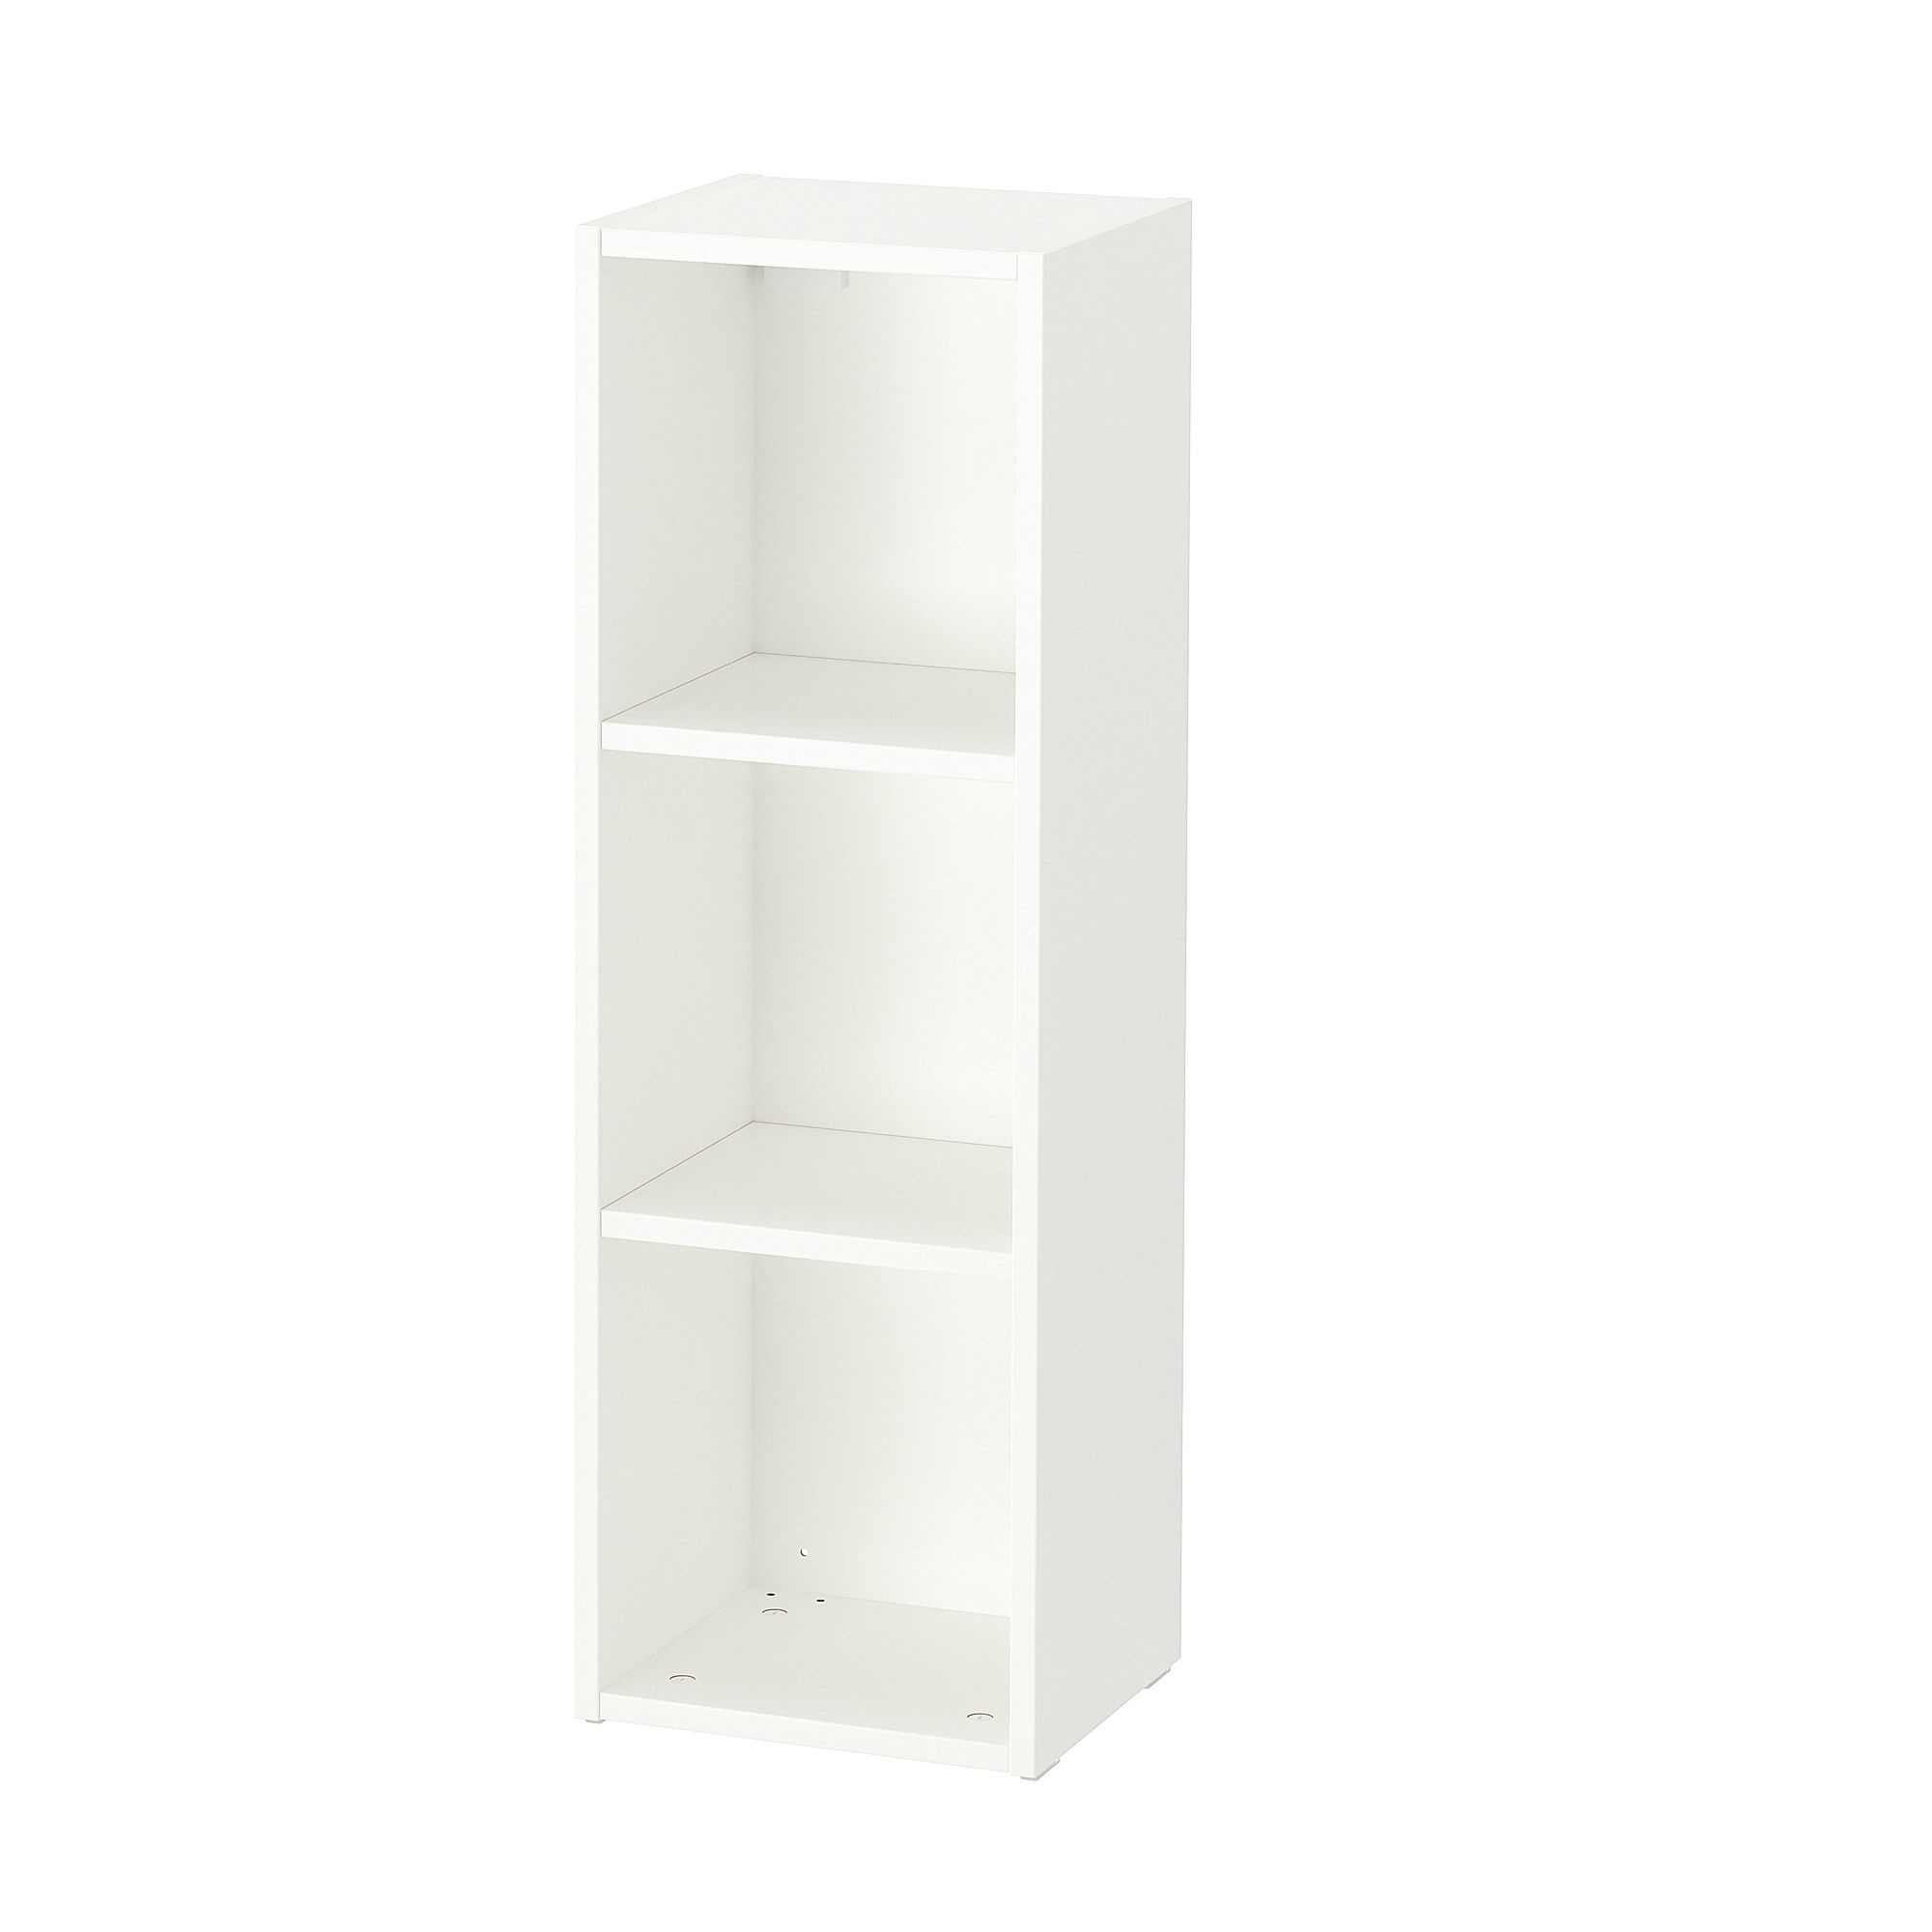 32+ Wall mounted storage units ikea trends